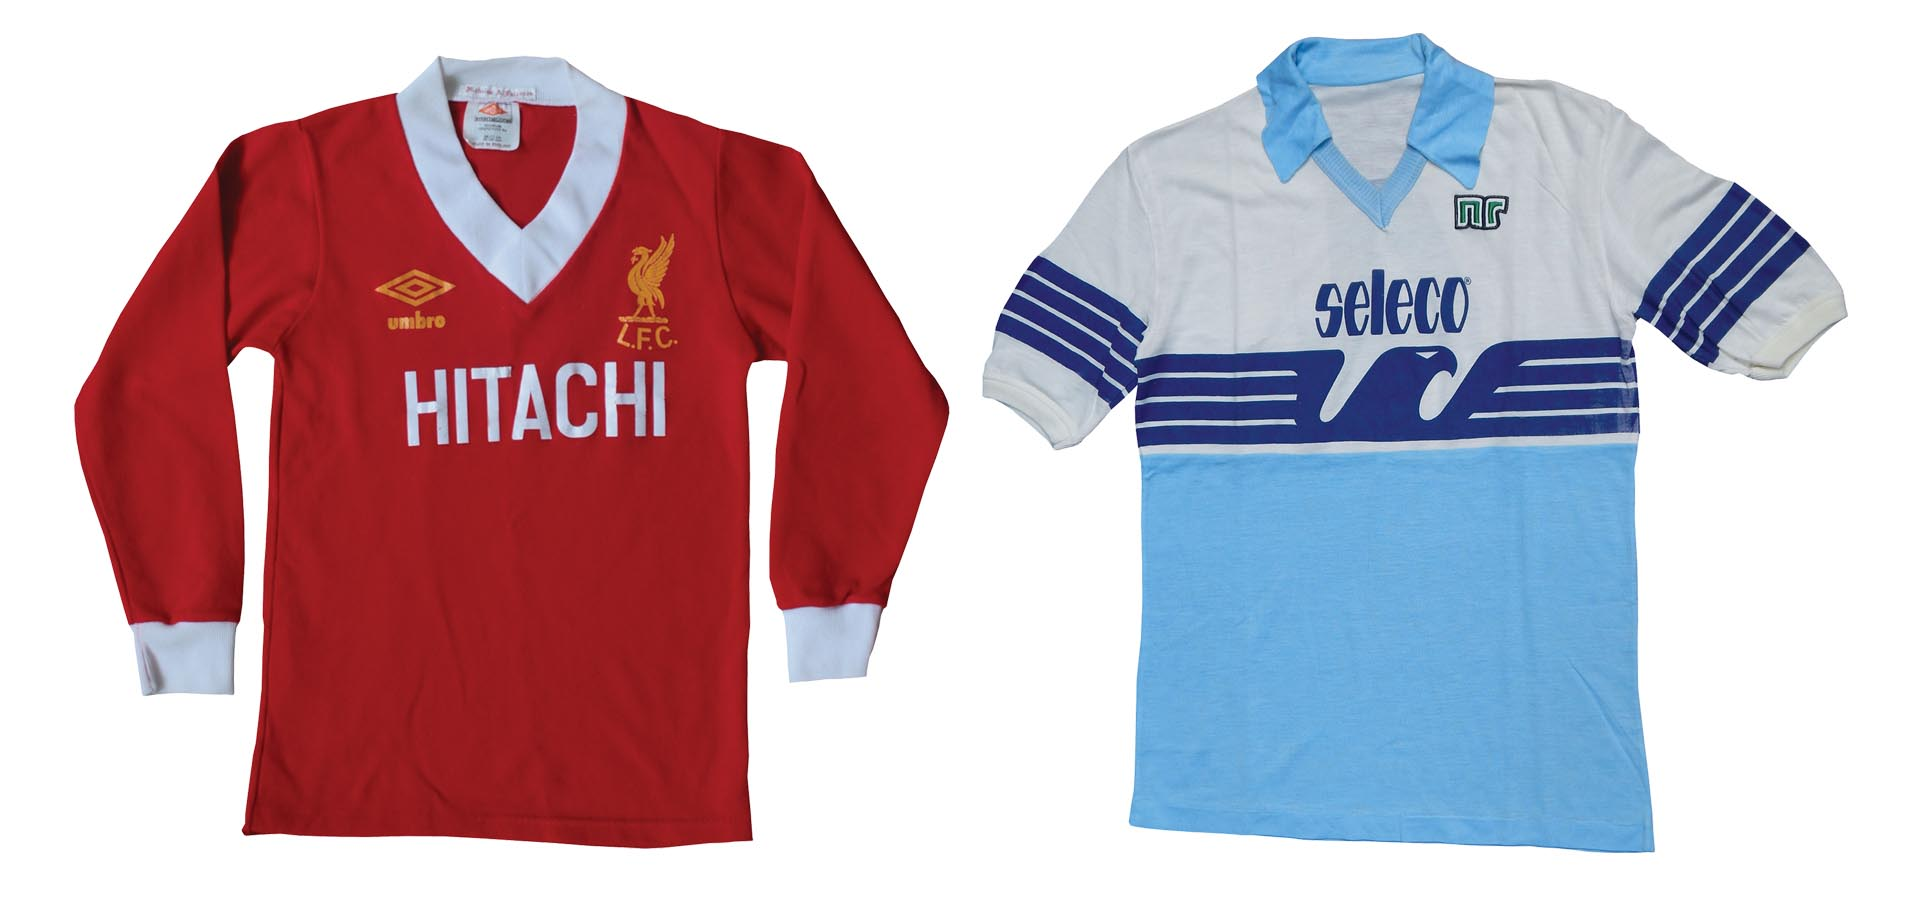 neal-heard-jacket-required-art-of-the-football-shirt_0003_liverpool-hitachi